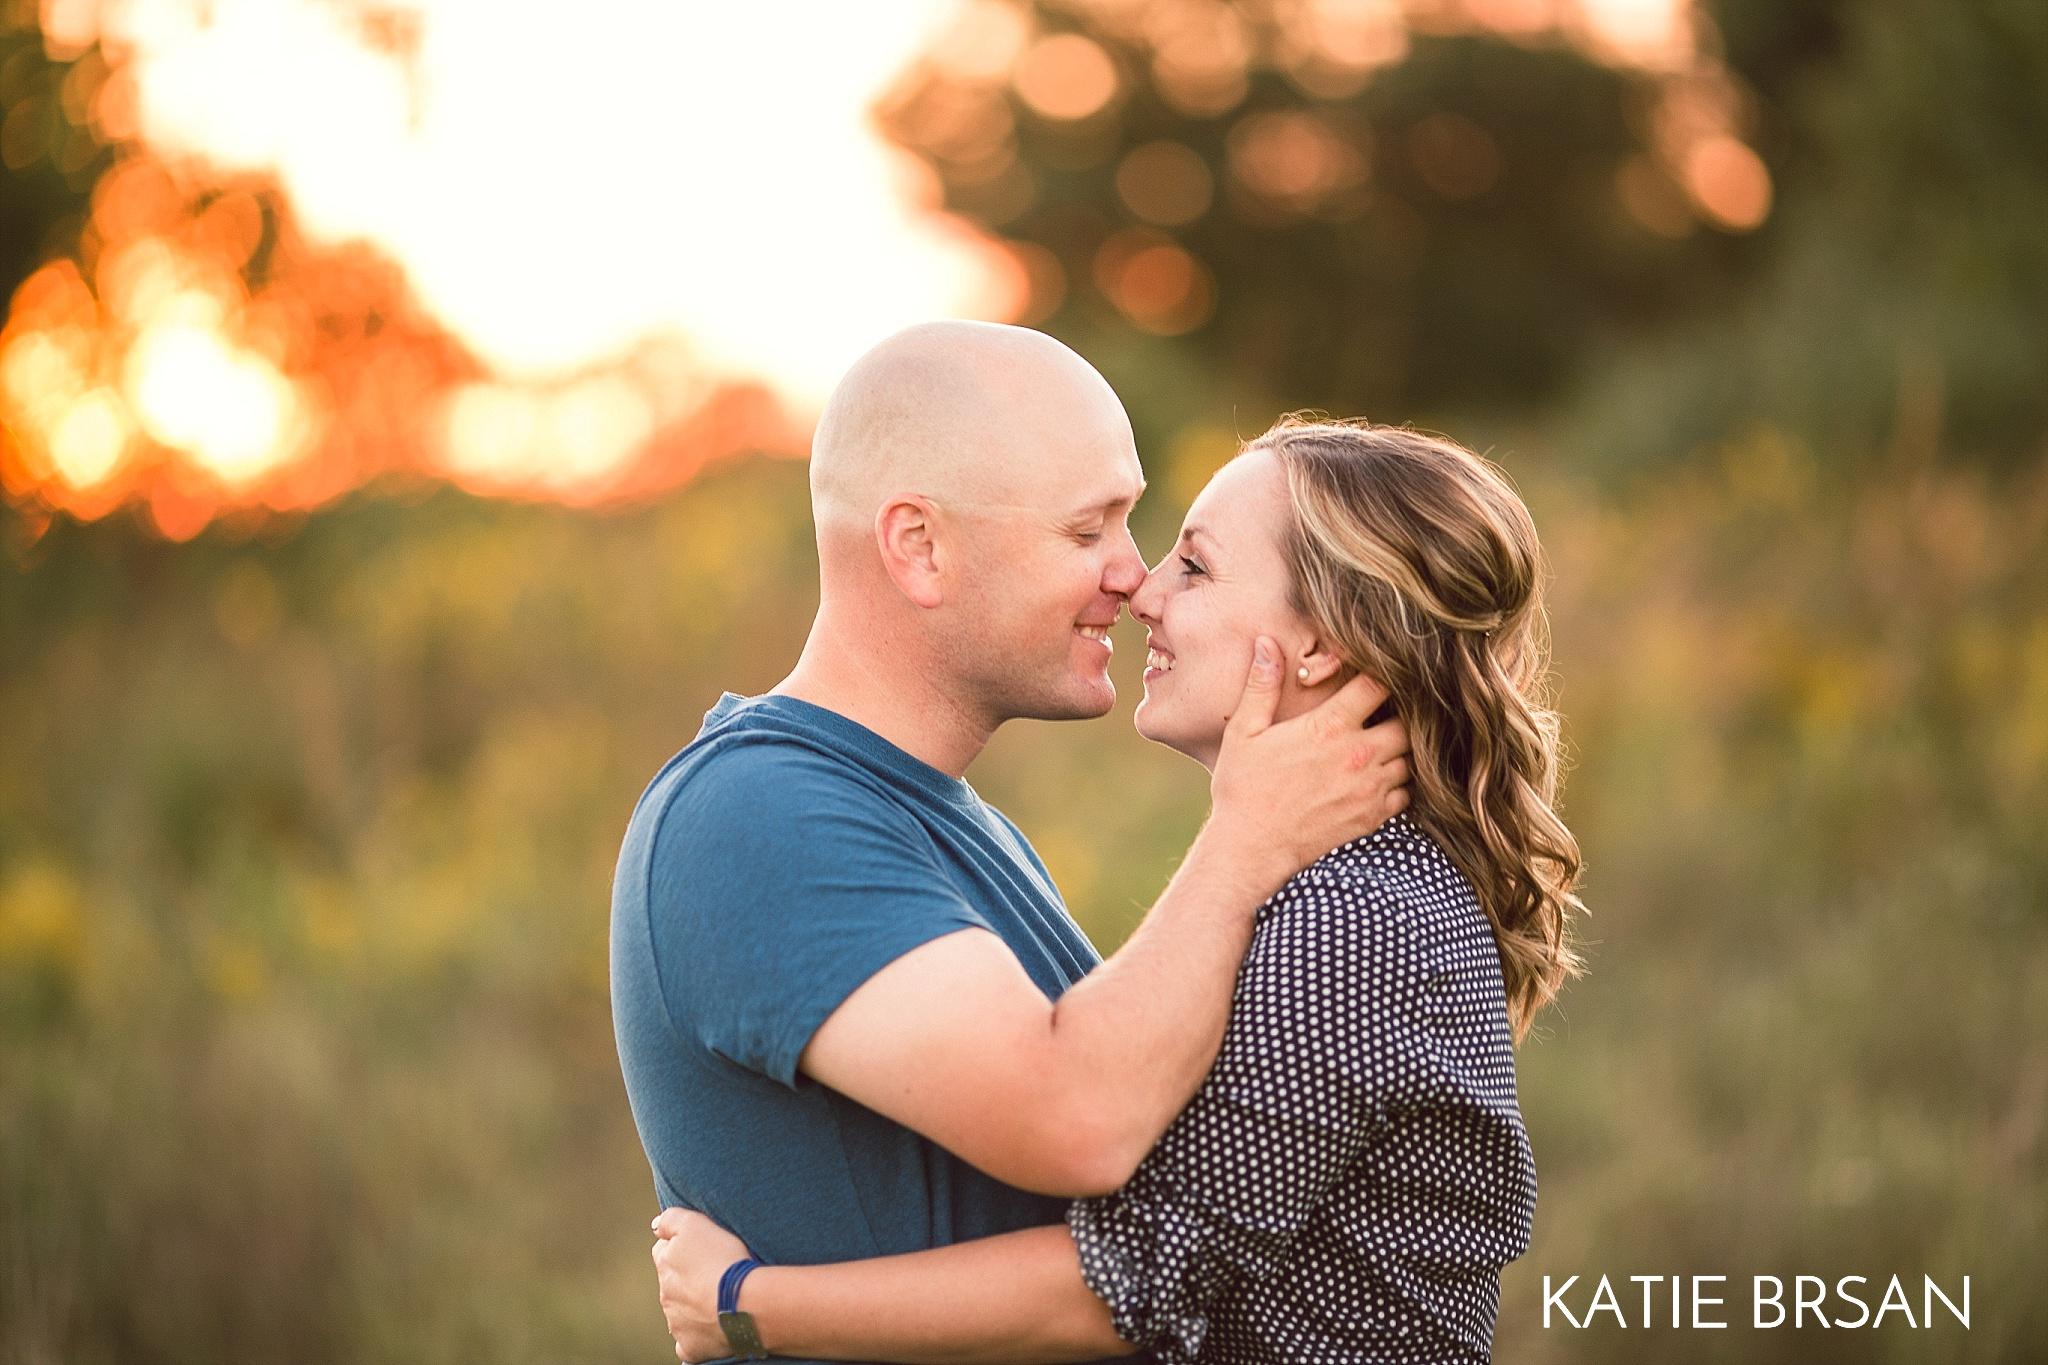 KatieBrsan-Chicago-Suburban-EngagementPictures-HadlyValley_0585.jpg